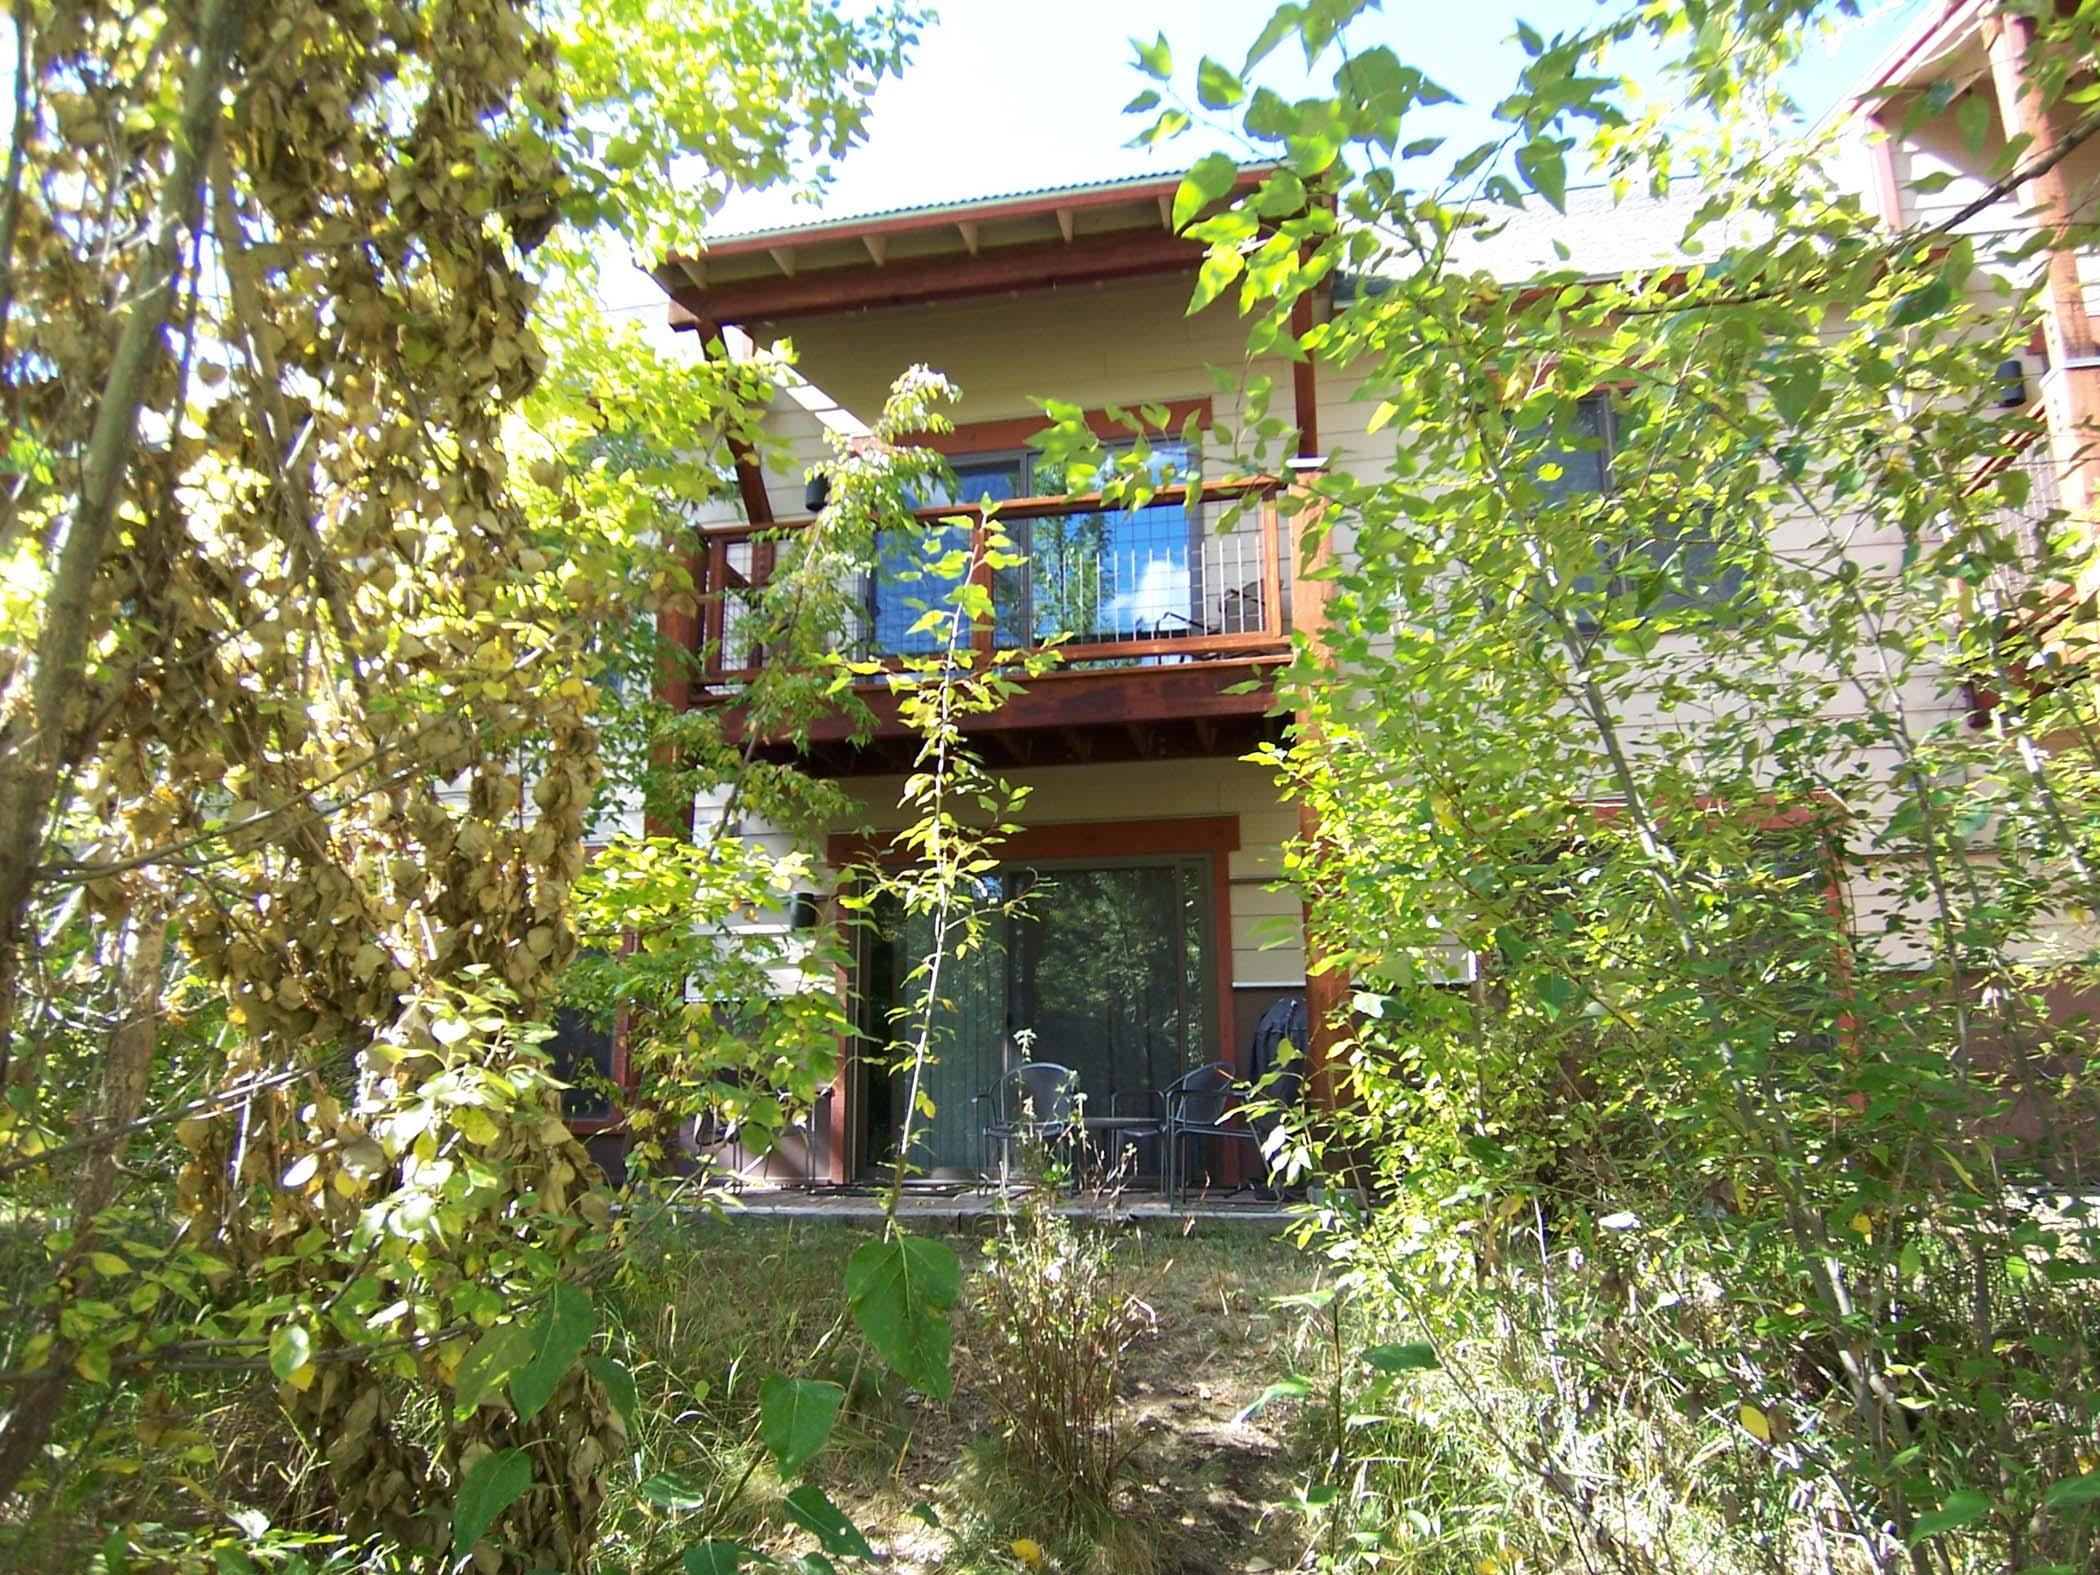 Кондоминиум для того Продажа на Furnished Ski Hill Road Condo- Driggs 2740 Shadowmoon Lane, Unit 114 Bannock Driggs, Айдахо, 83422 Jackson Hole, Соединенные Штаты